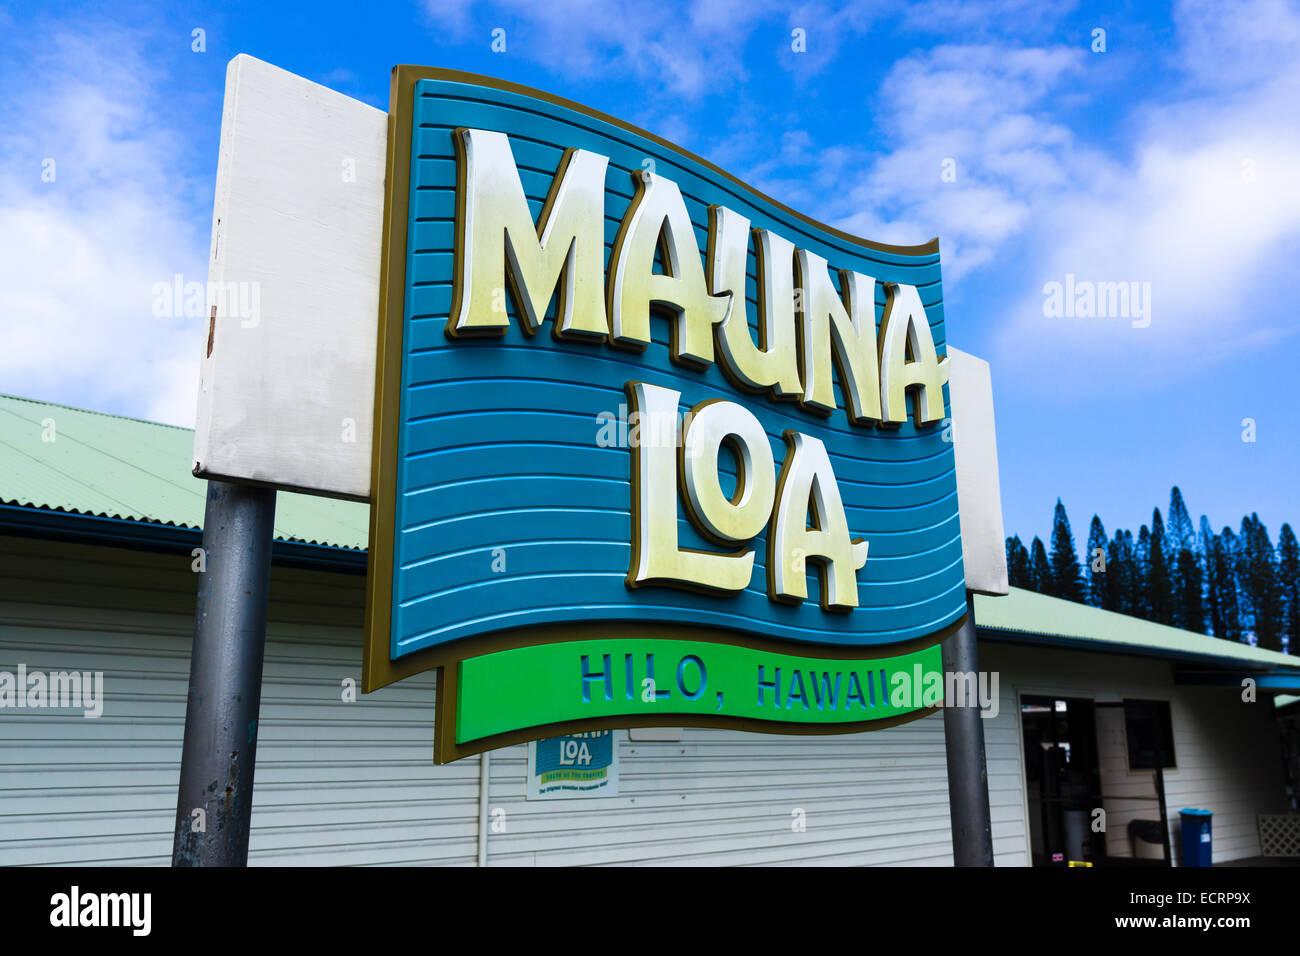 Mauna Loa Macadamia Nut Corporation, Hilo, Big Island, Hawaii, United States. - Stock Image